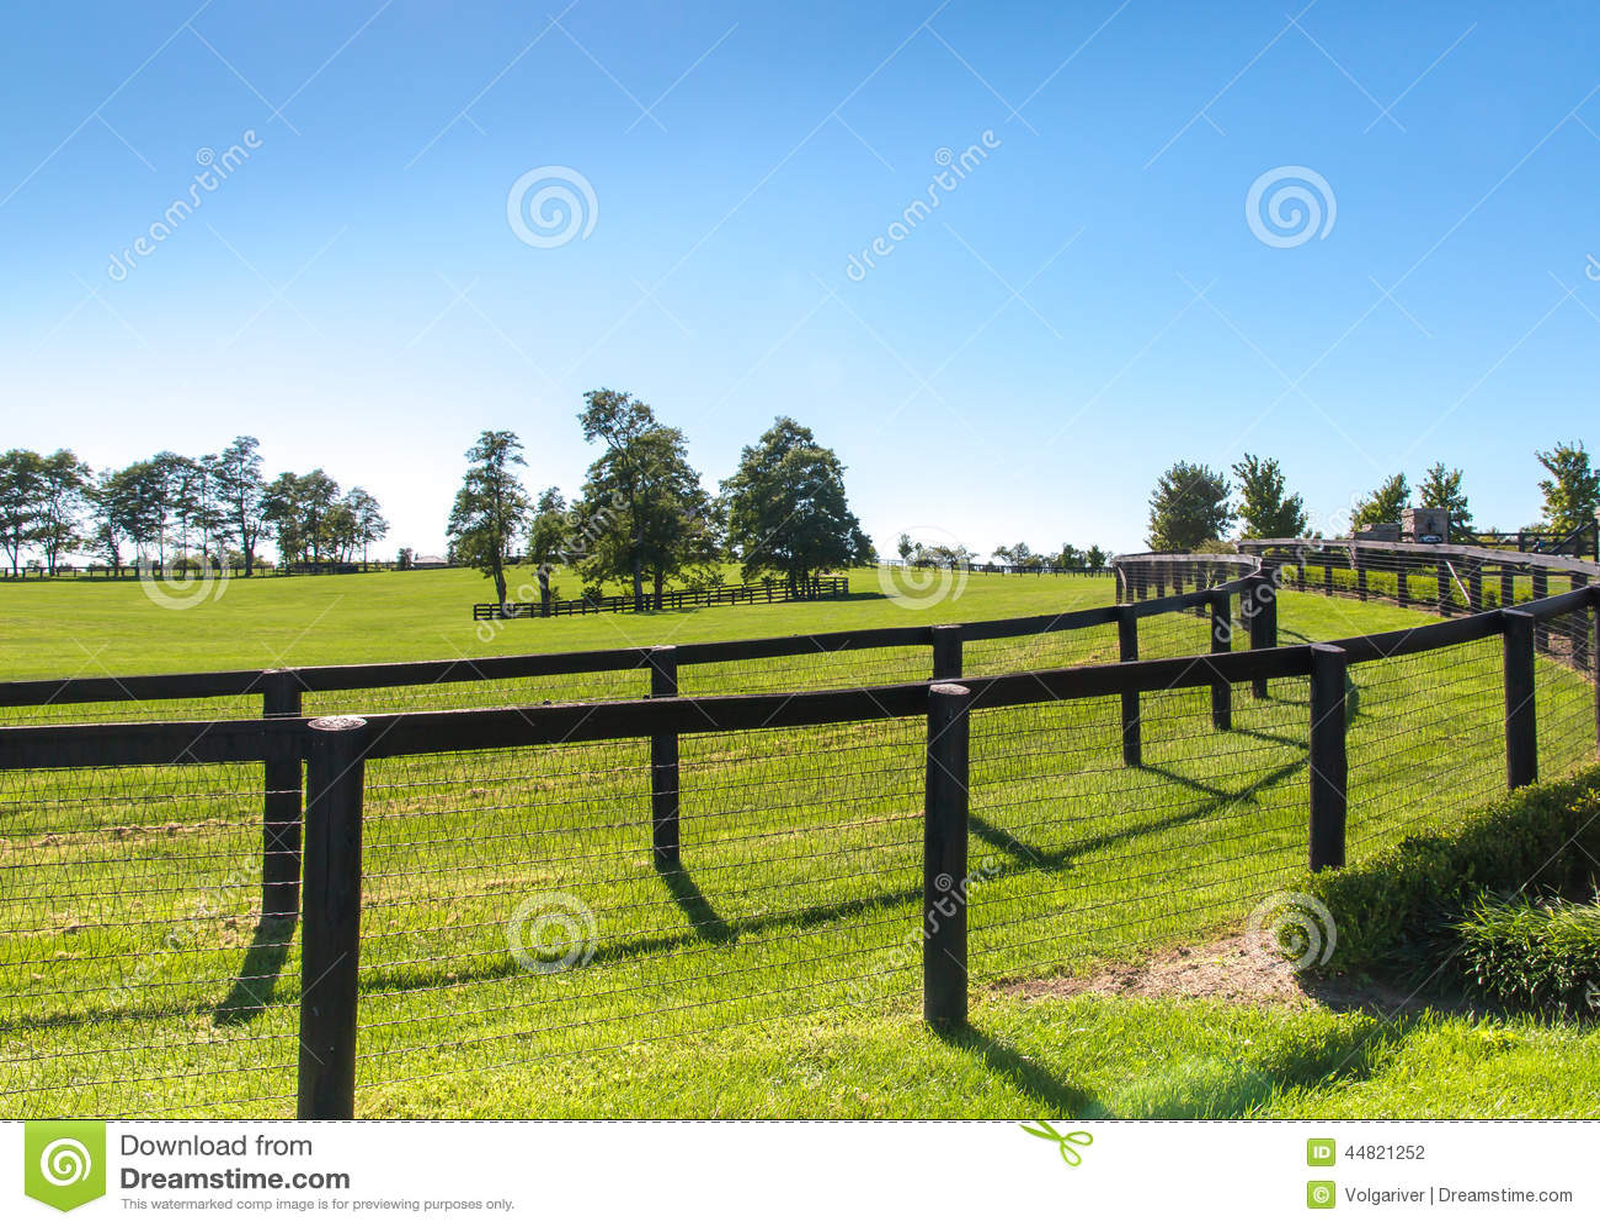 Double Fence At Horse Farm Stock Photo Image 44821252